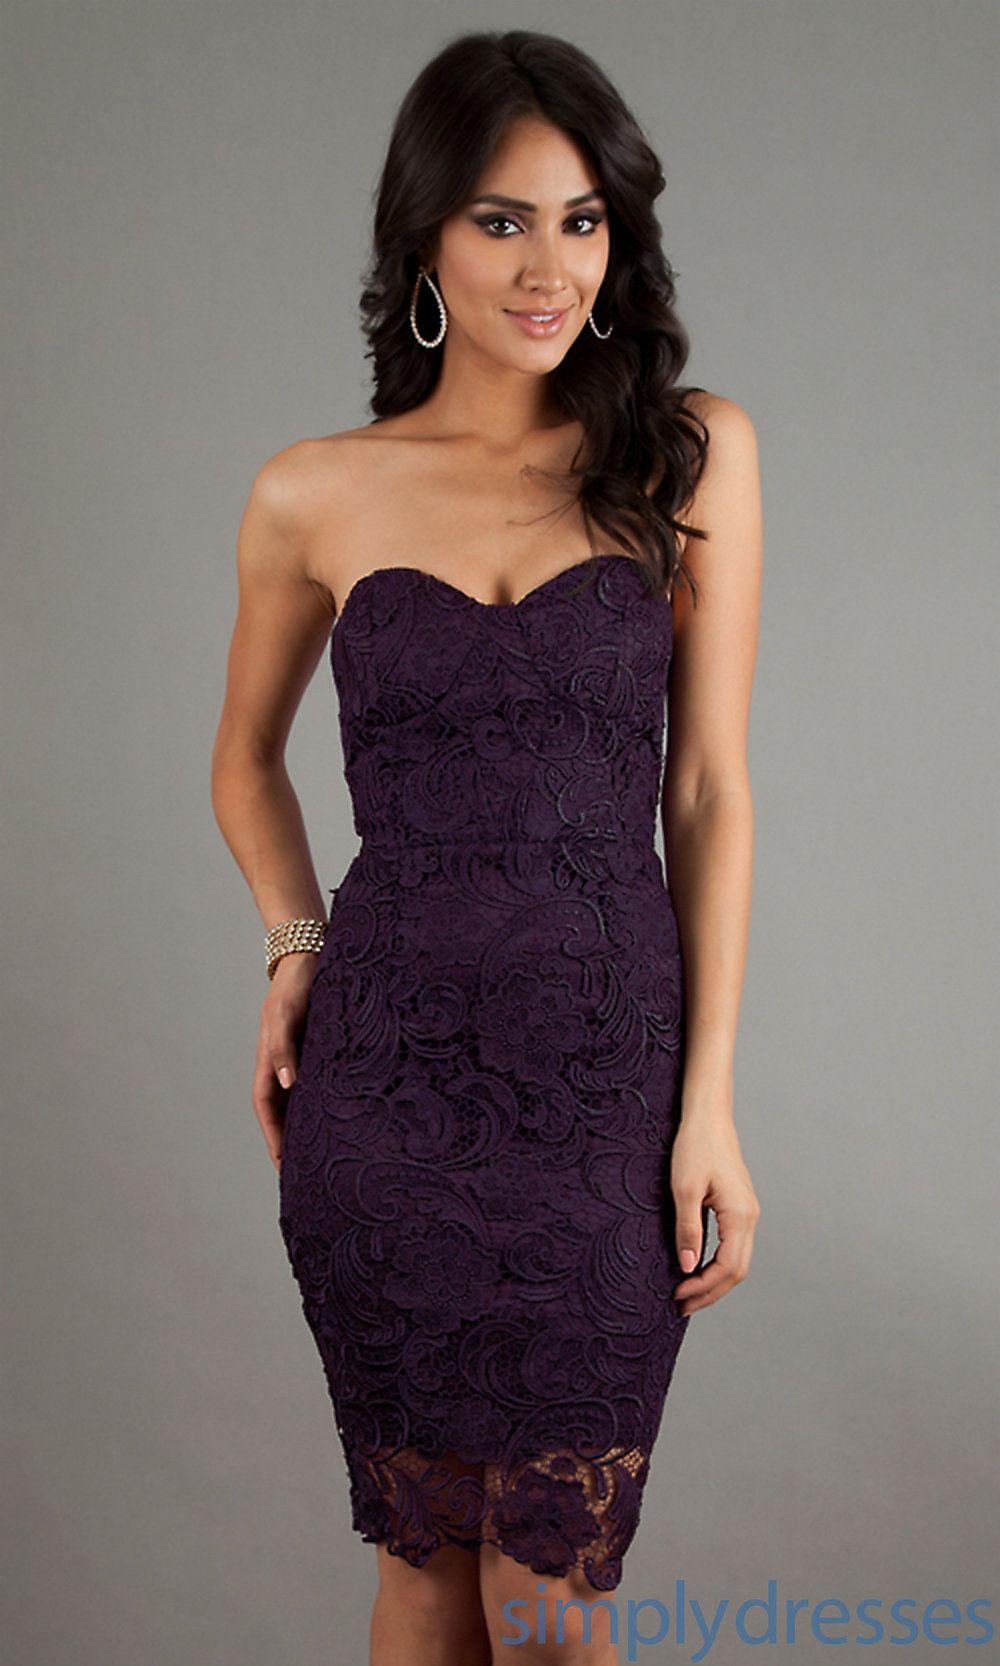 Short Strapless Sweetheart Lace Dress Short Dresses Strapless Lace Dress Formal Dresses Short [ 1666 x 1000 Pixel ]